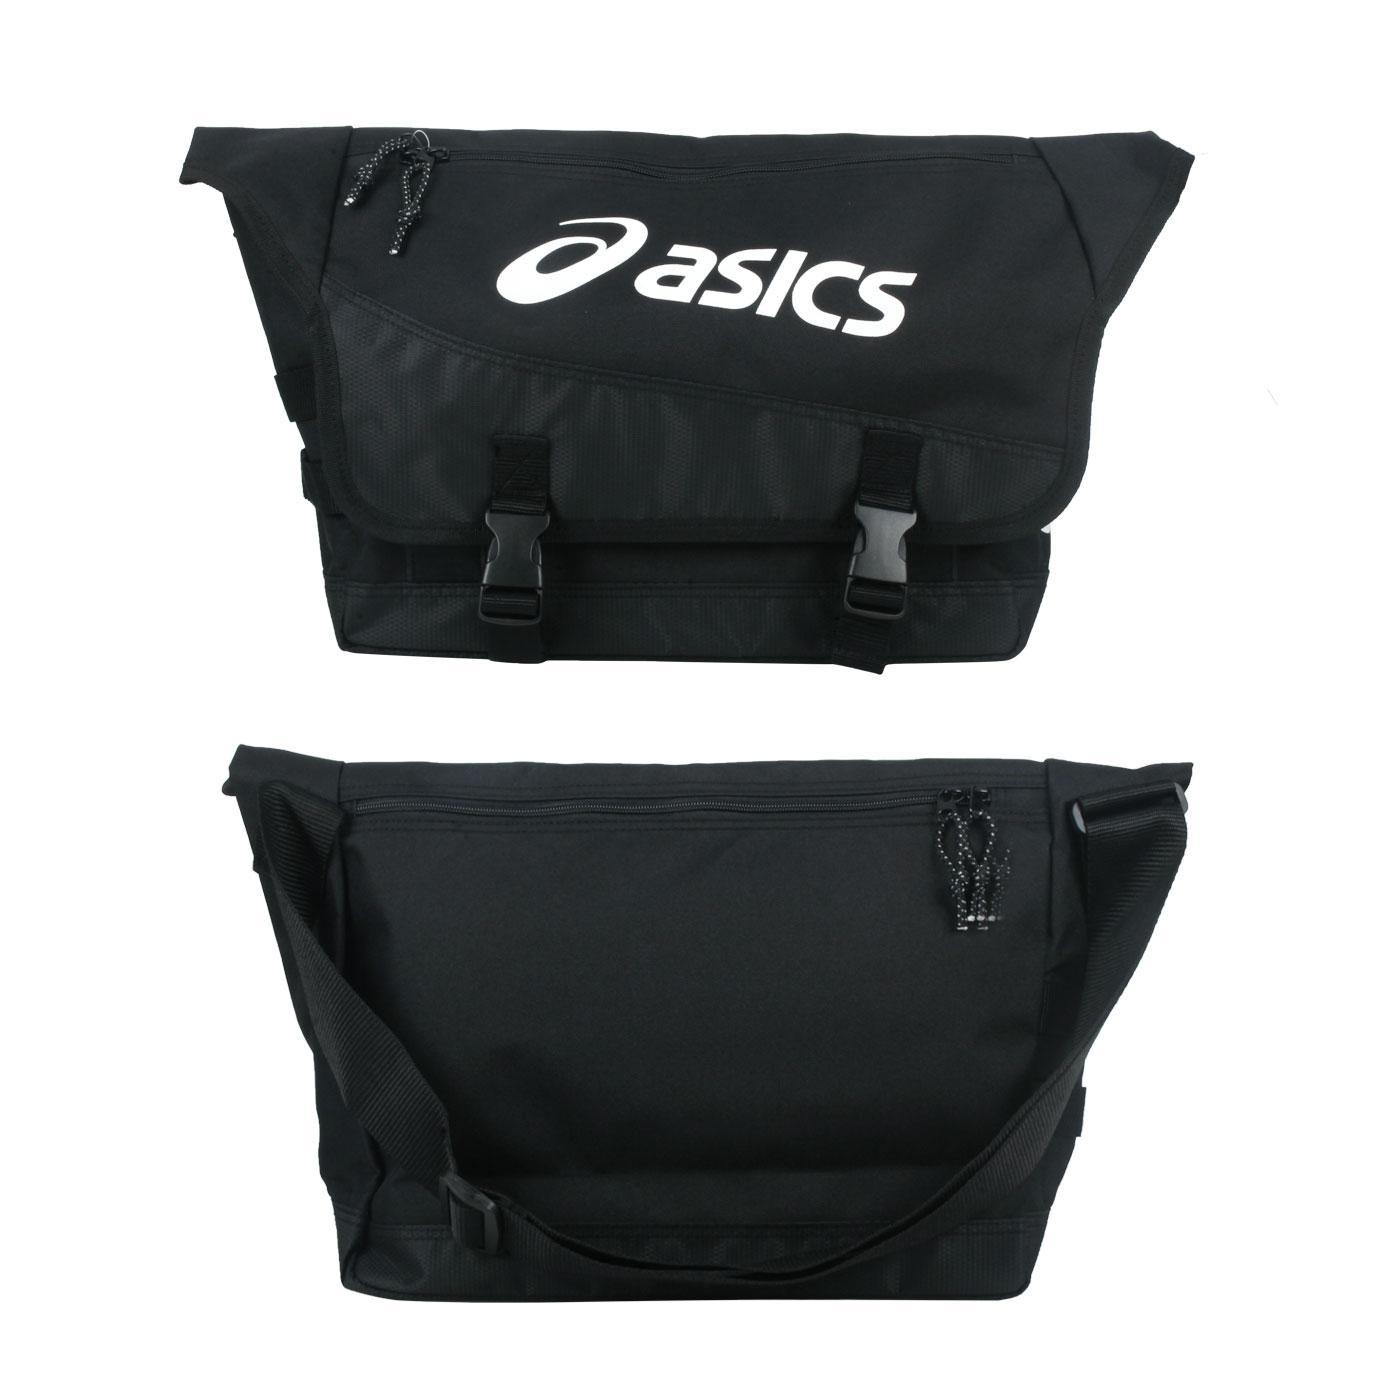 ASICS 側背包 Y32002-90 - 黑白